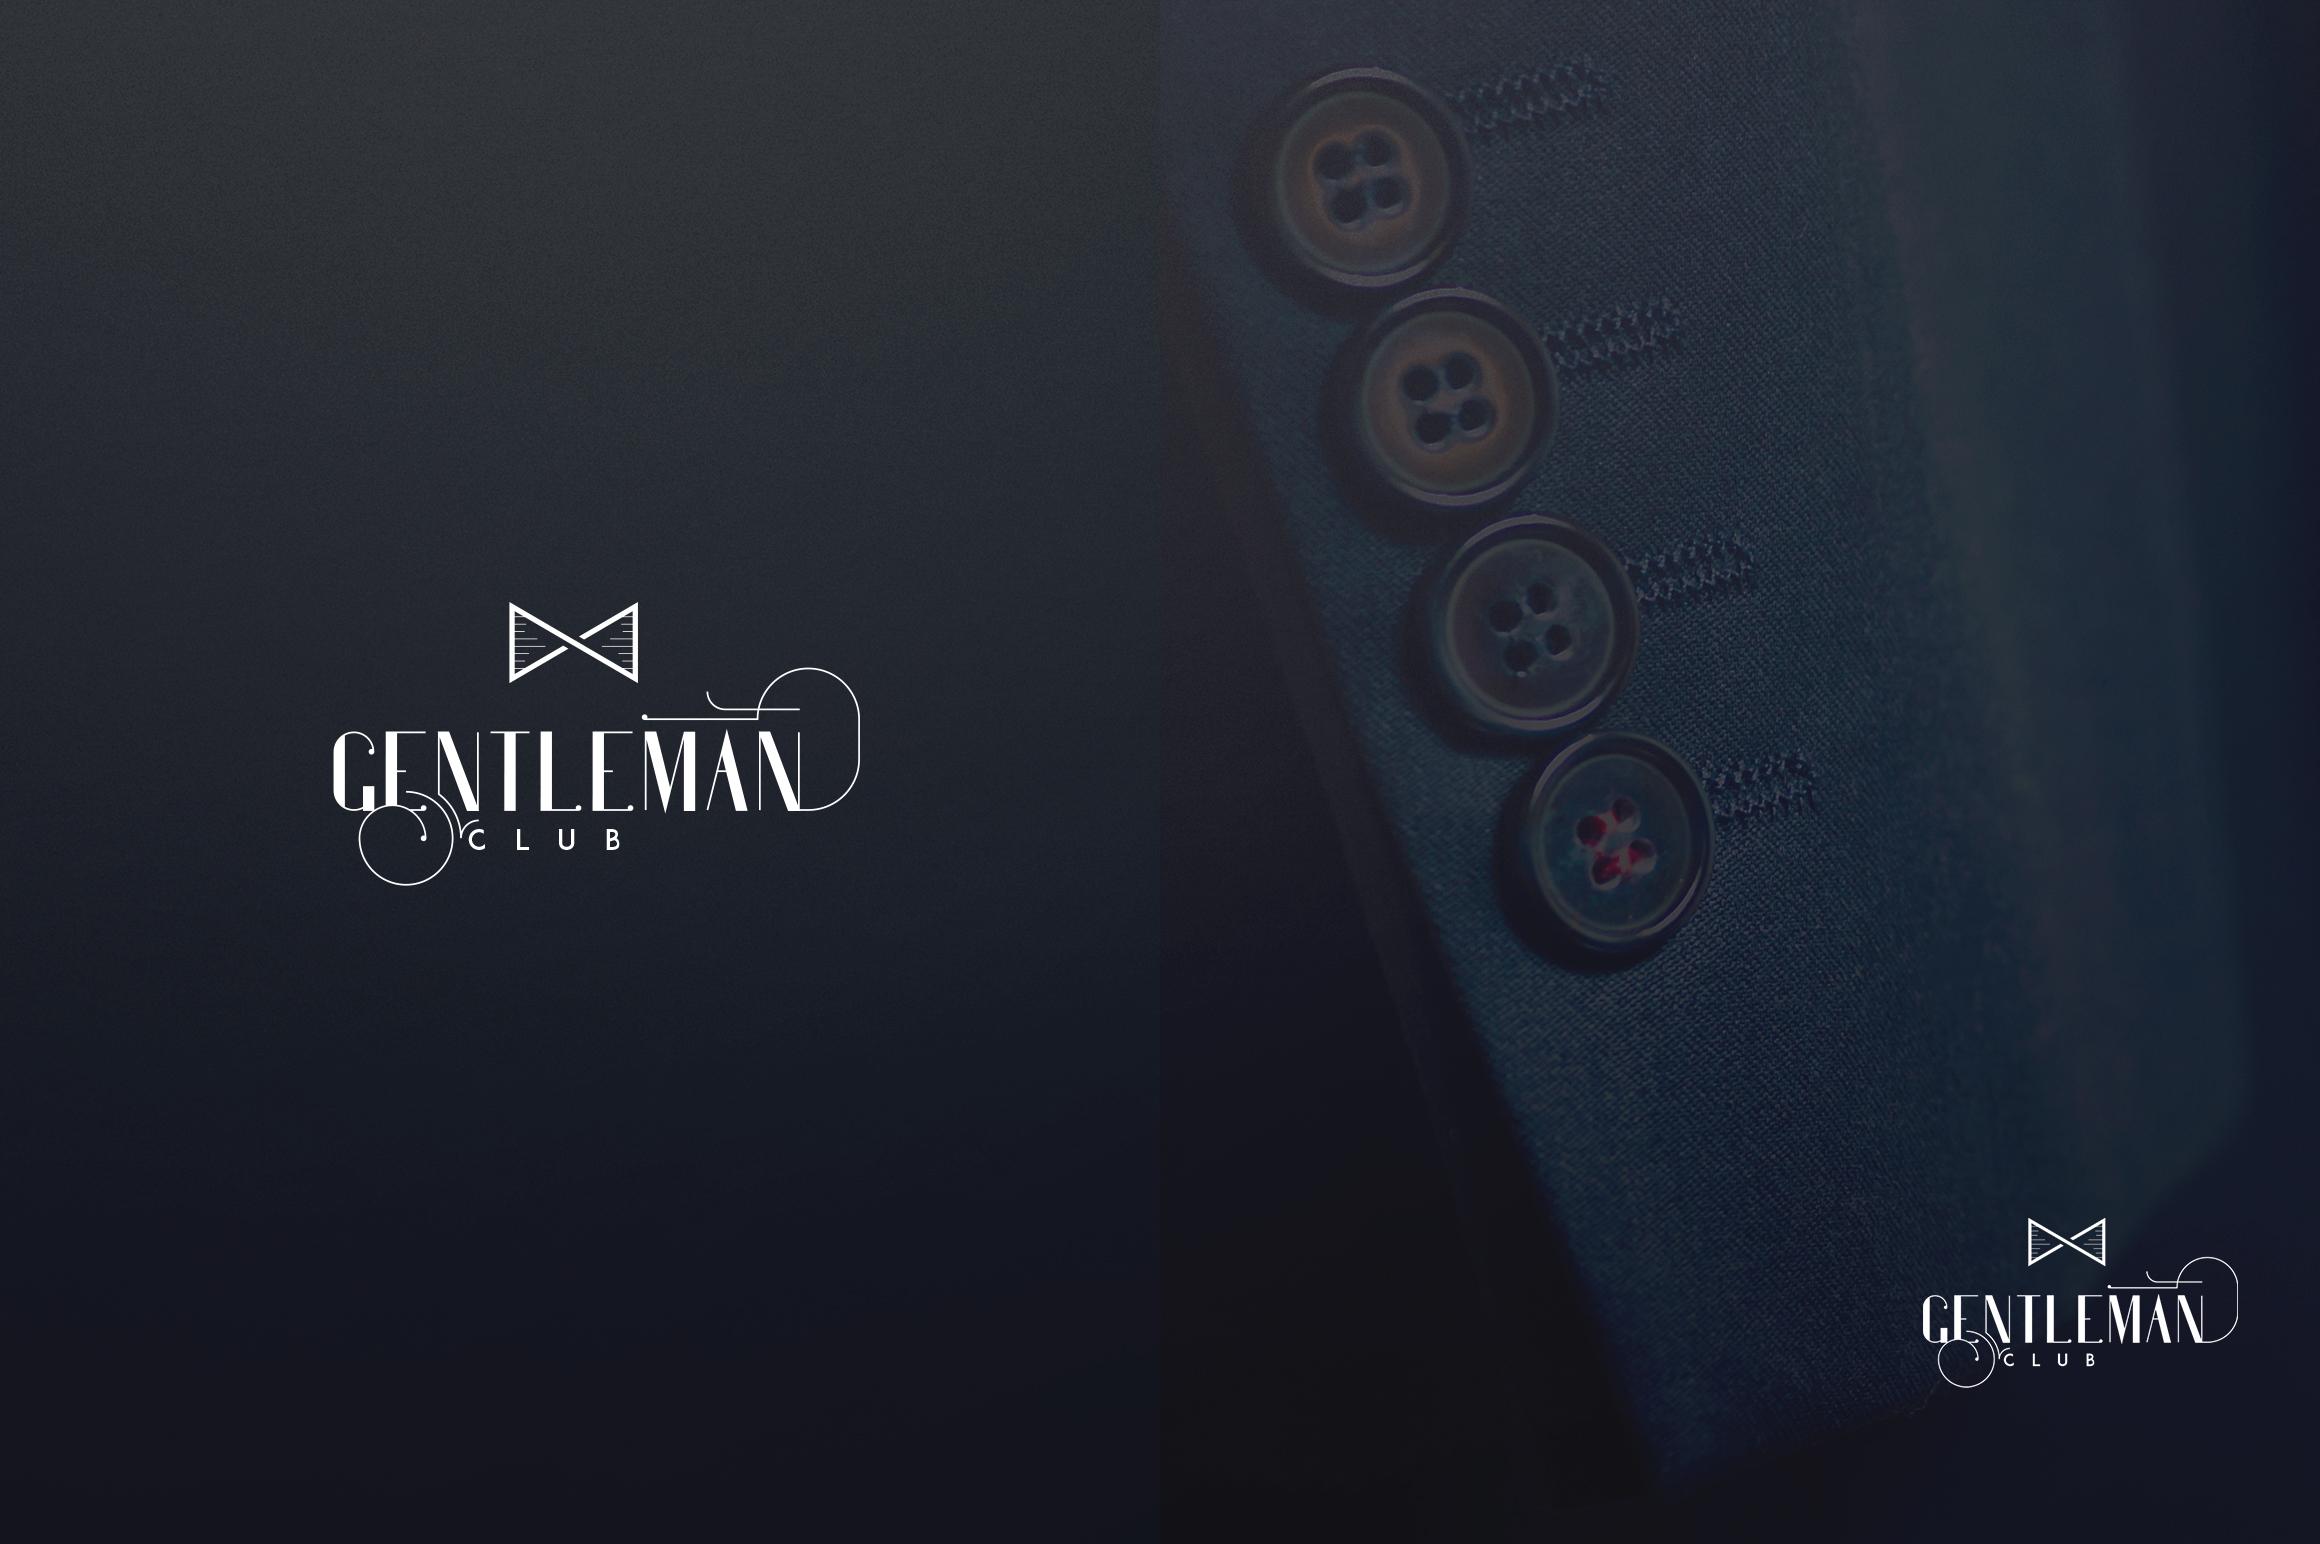 Gentleman font  10 Logo Templates example image 14